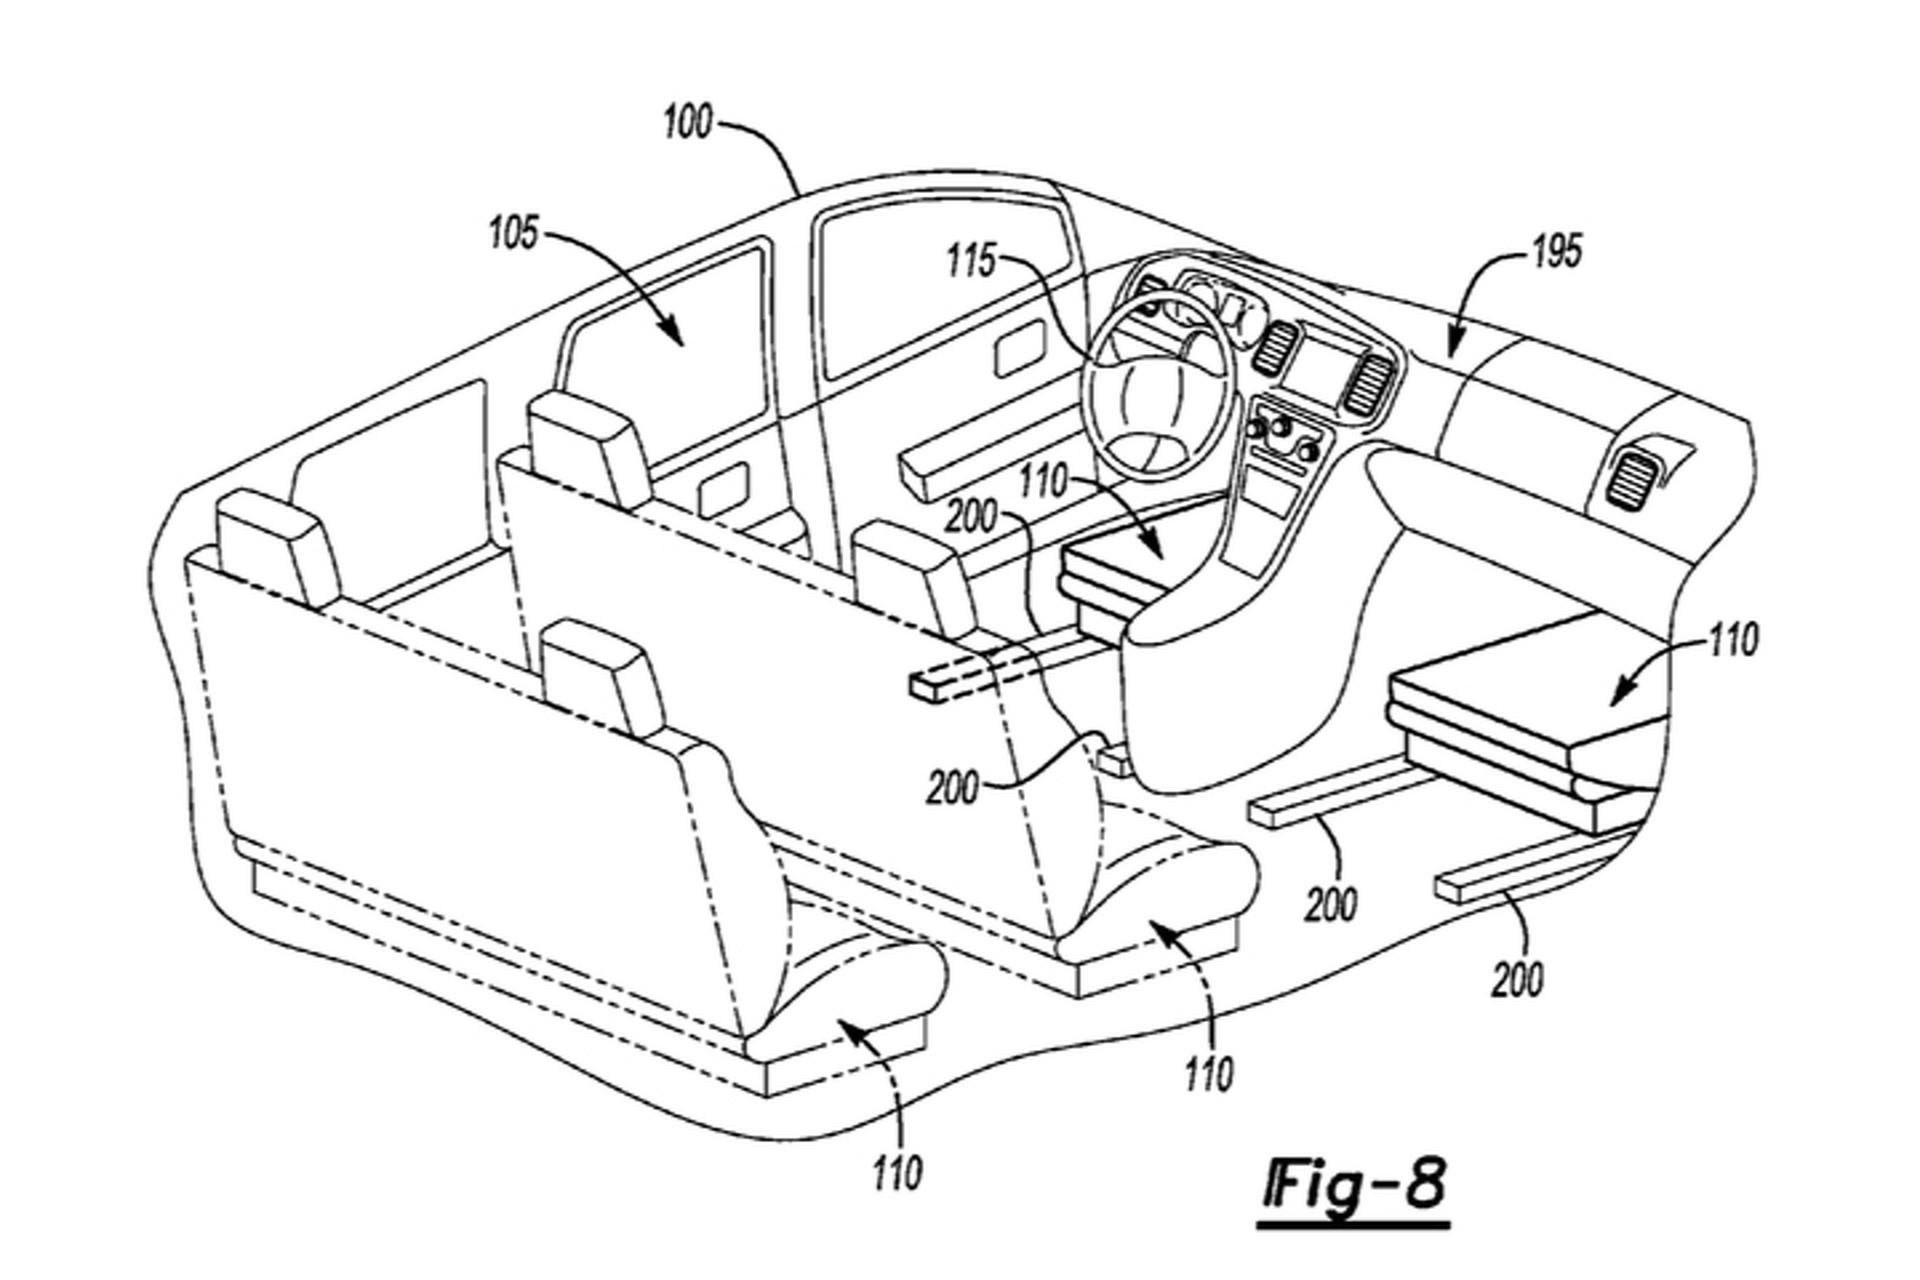 New Ford Patent Reveals Shape-Shifting Car Interior